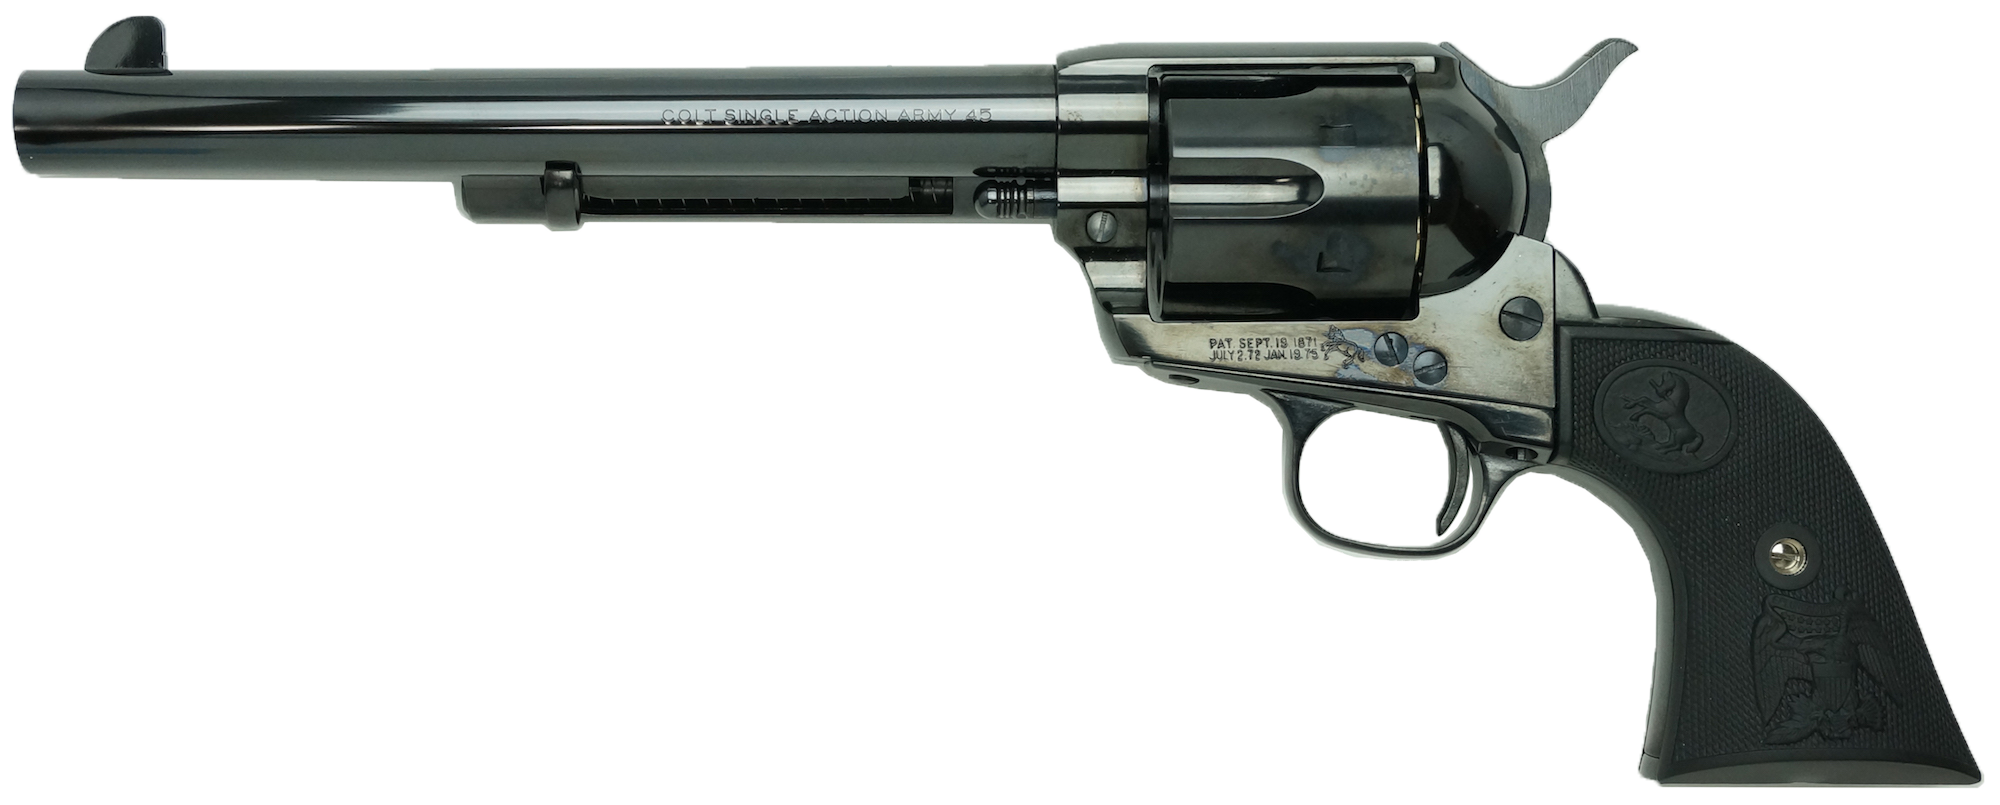 Colt S.A.A.45 7-1/2inch Cavalry(2nd)デタッチャブル・シリンダー スチール・フィニッシュ (ガスガン)